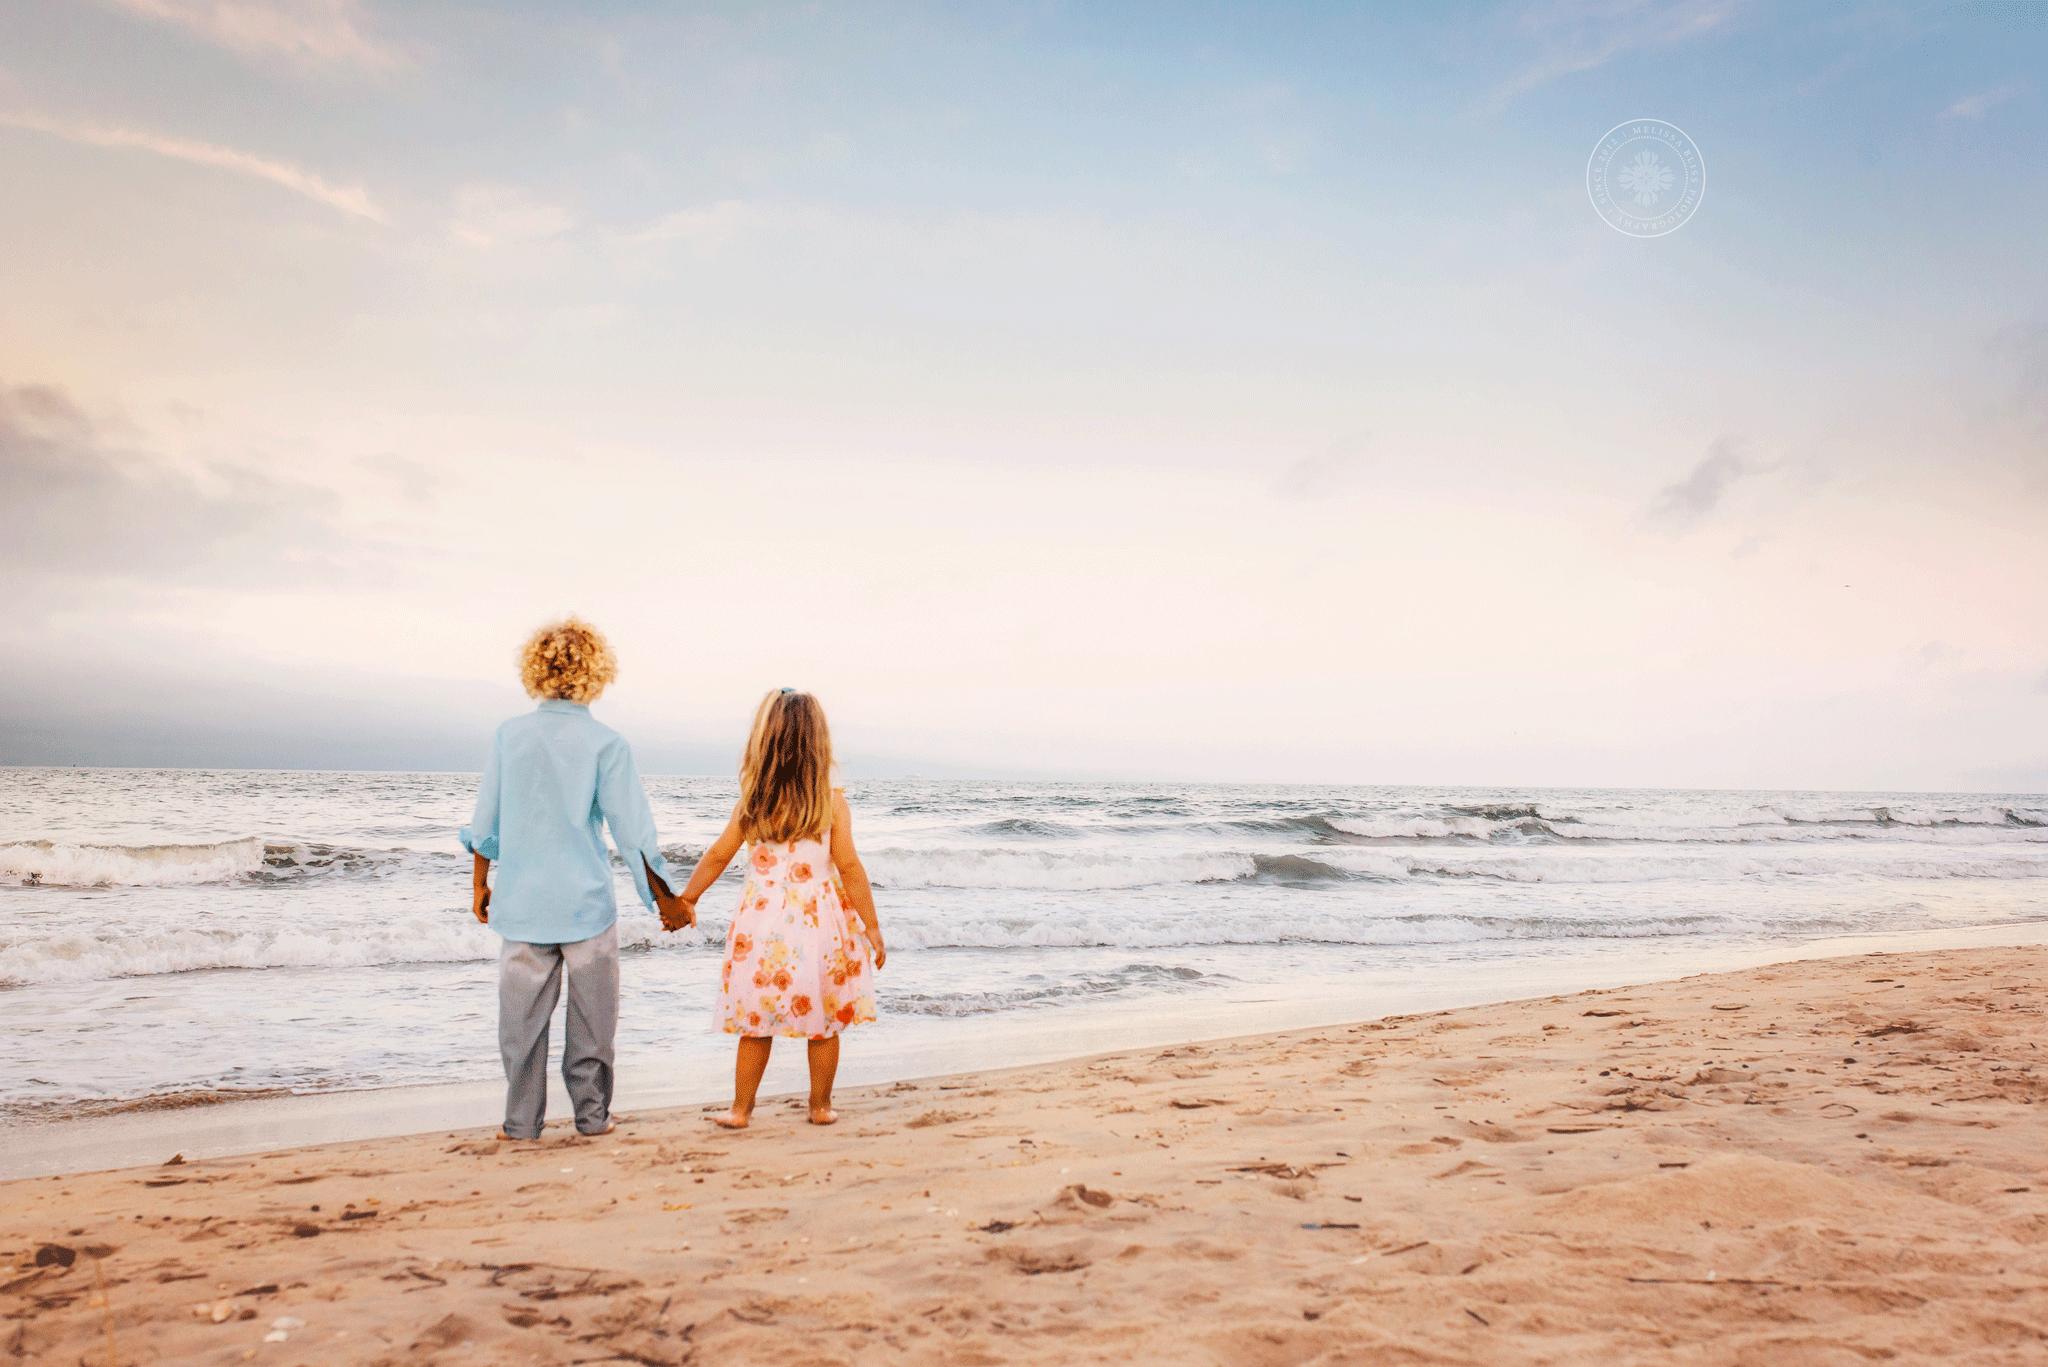 melissa-bliss-photography-child-photographers-kids-on-beach-at-sunset-virginia-beach-sandbridge-photographers.png